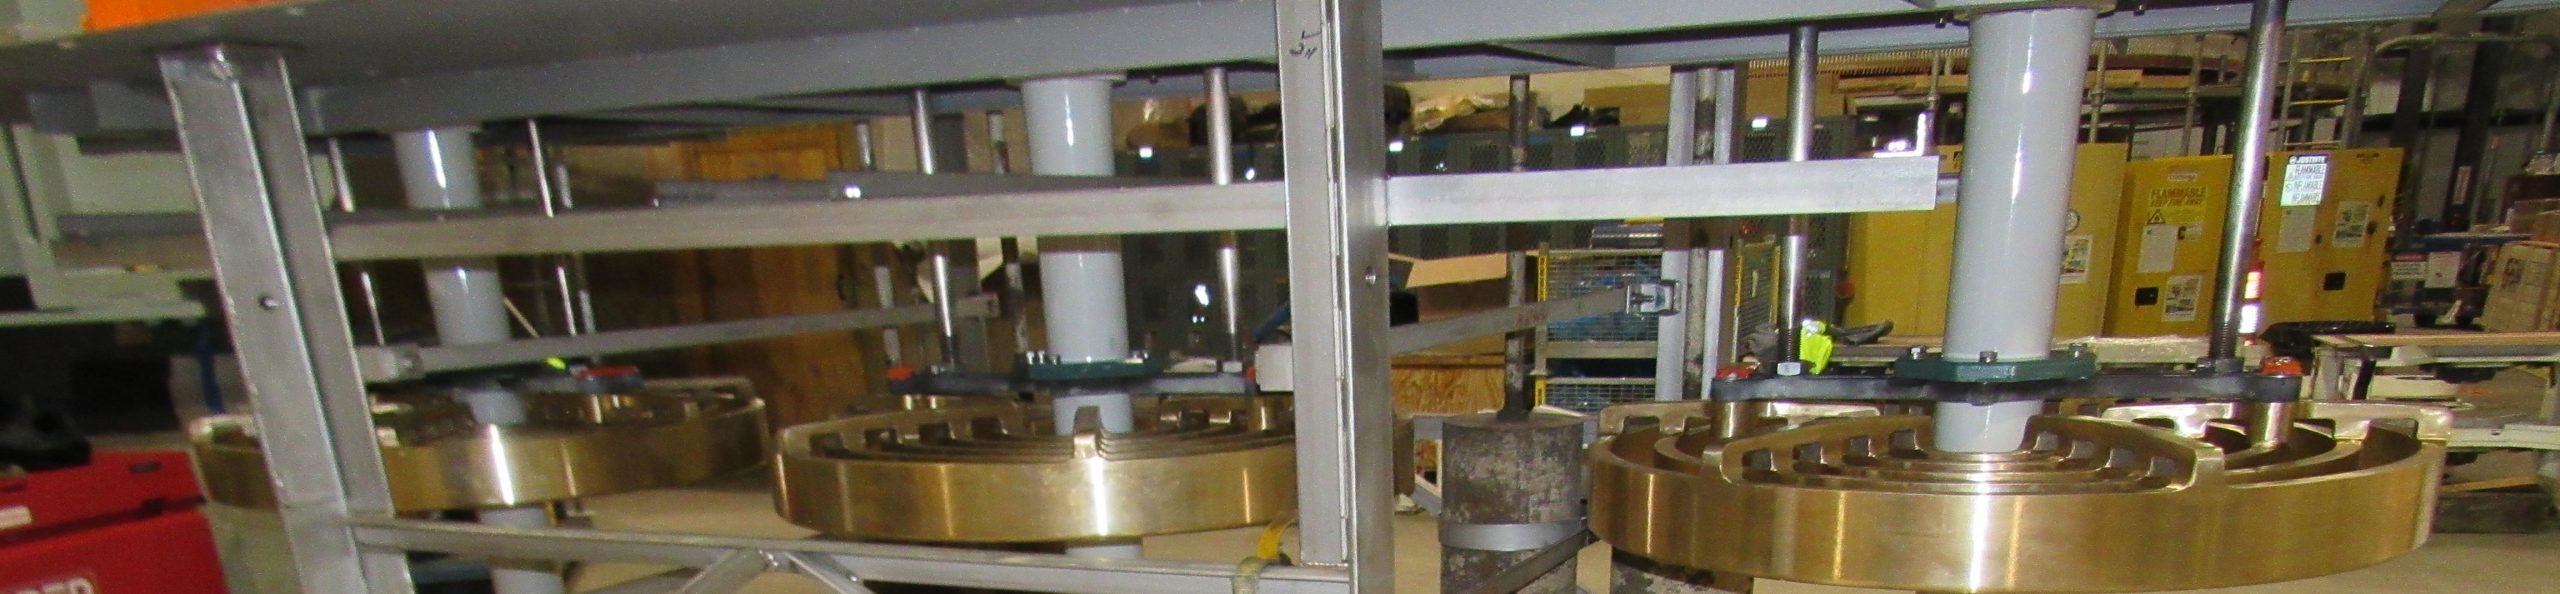 Ludington Pump Storage Major Unit Overhaul